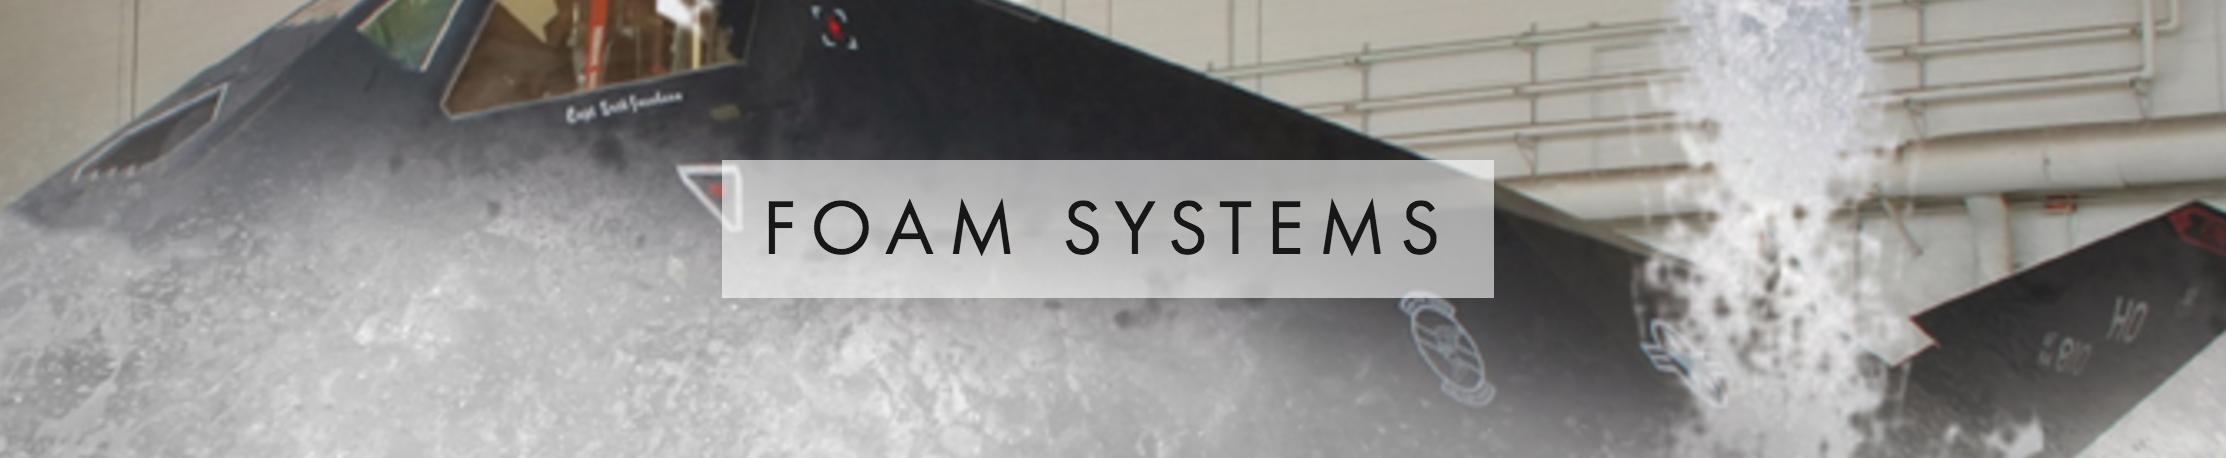 FOAM SYSTEM SOLUTIONS